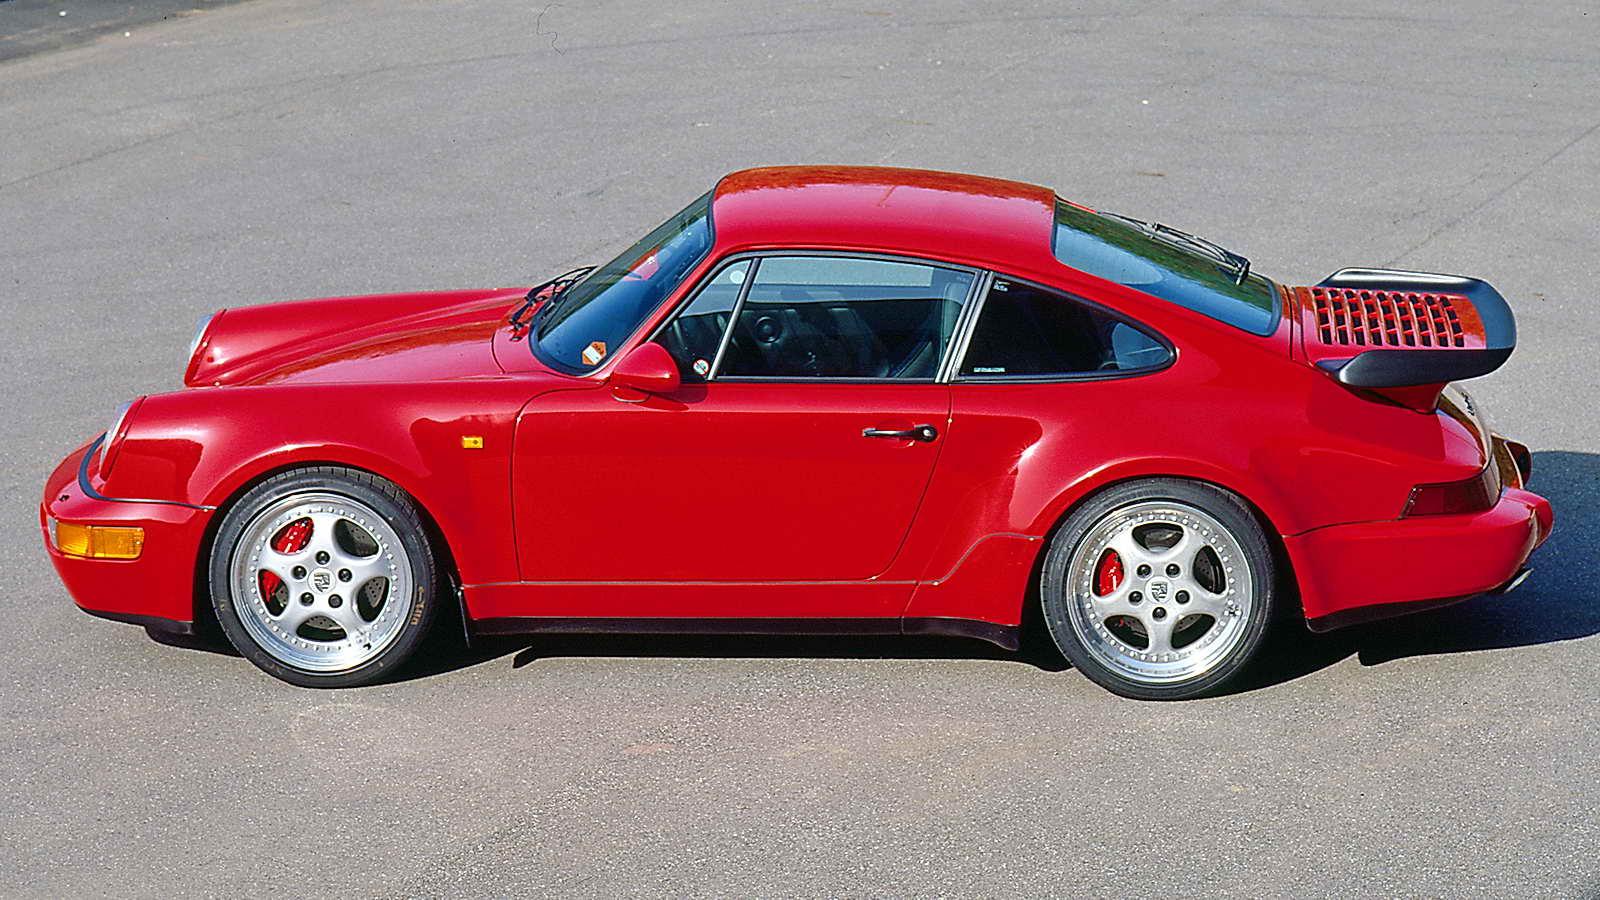 1988 Porsche 911 >> Historia del Porsche 911 - Tercera generación (1988): el Porsche 964